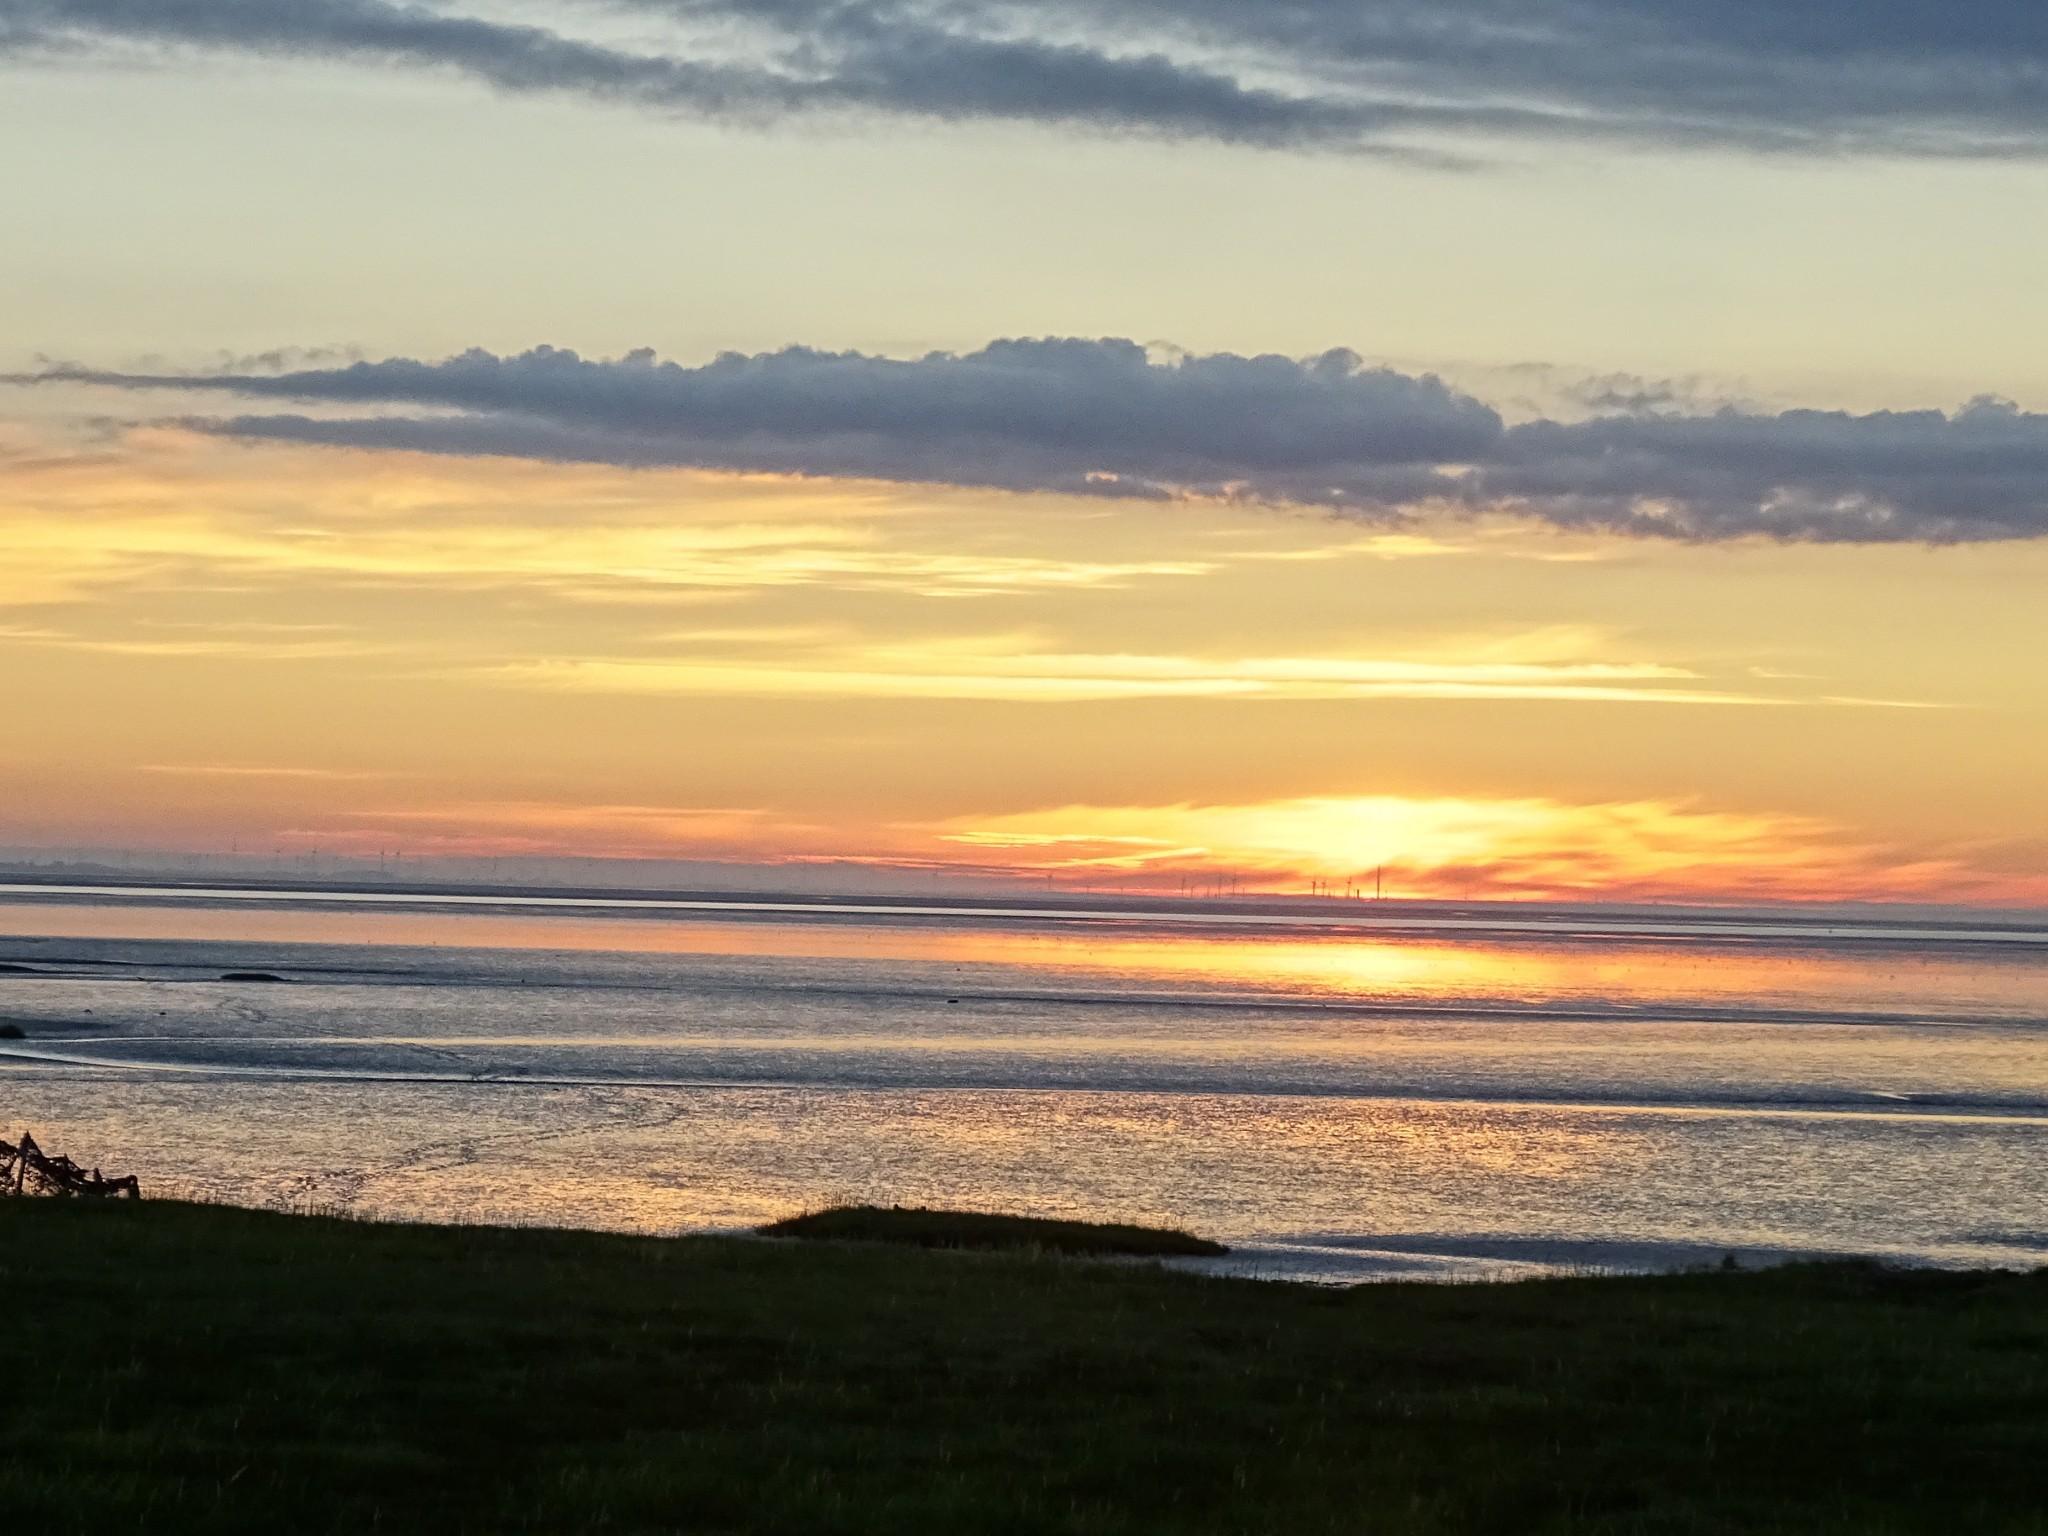 Sonnenaufgang über dem Watt